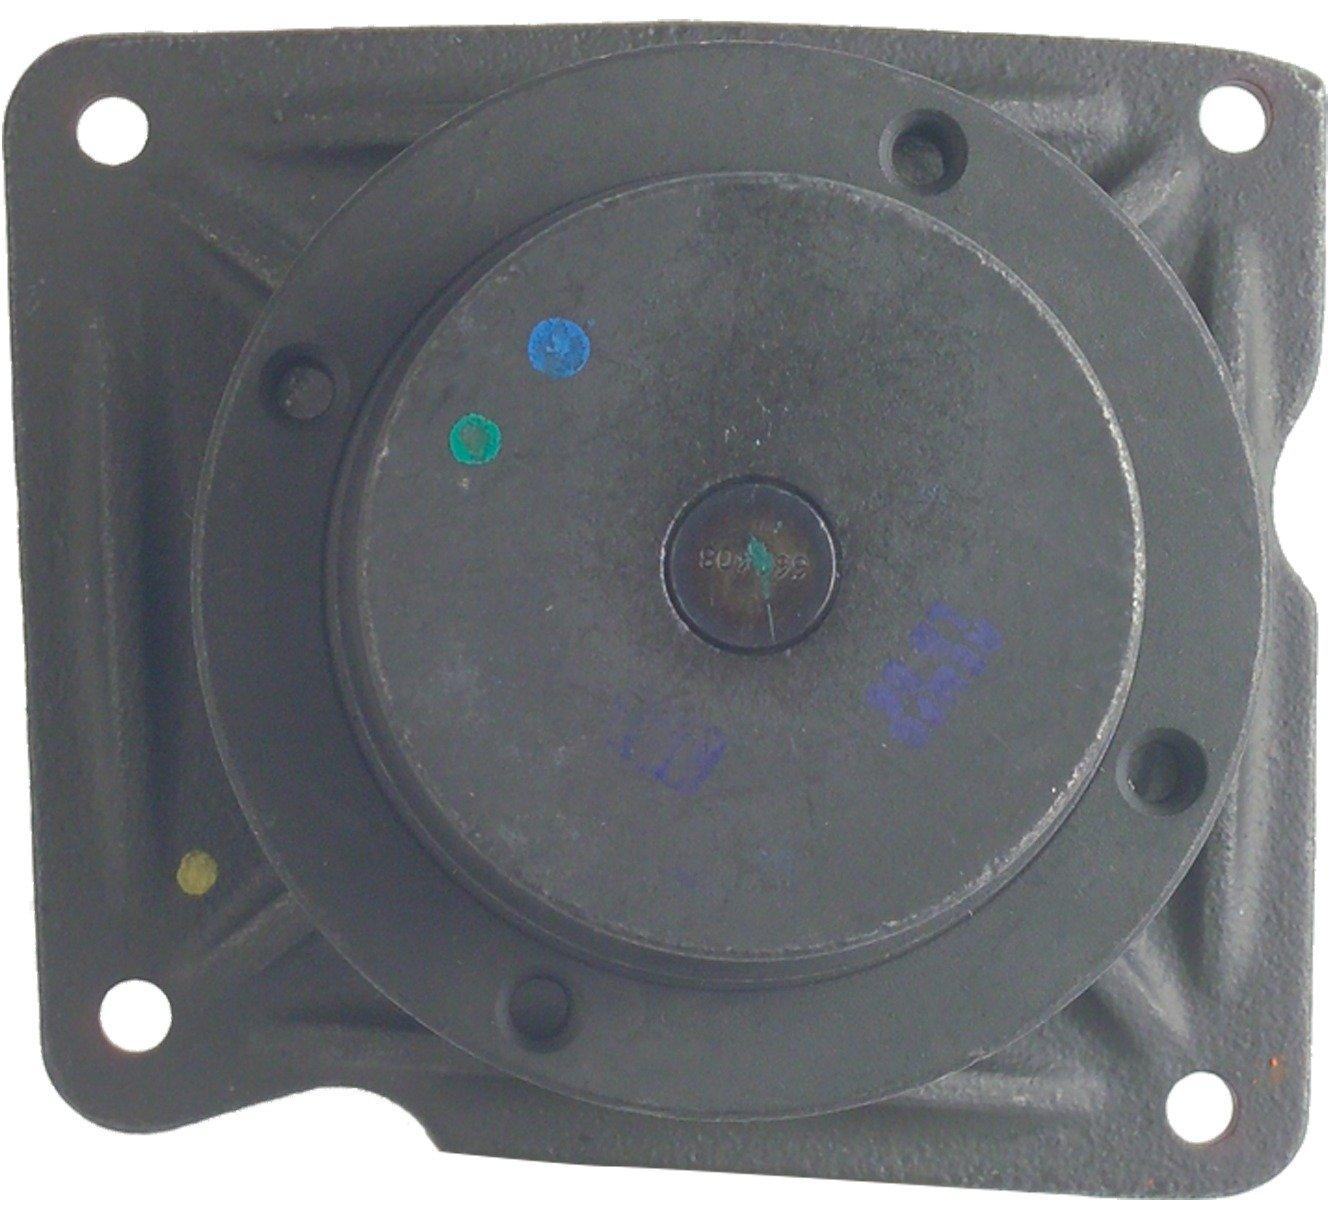 Cardone 59-8186 Remanufactured Heavy Duty Water Pump